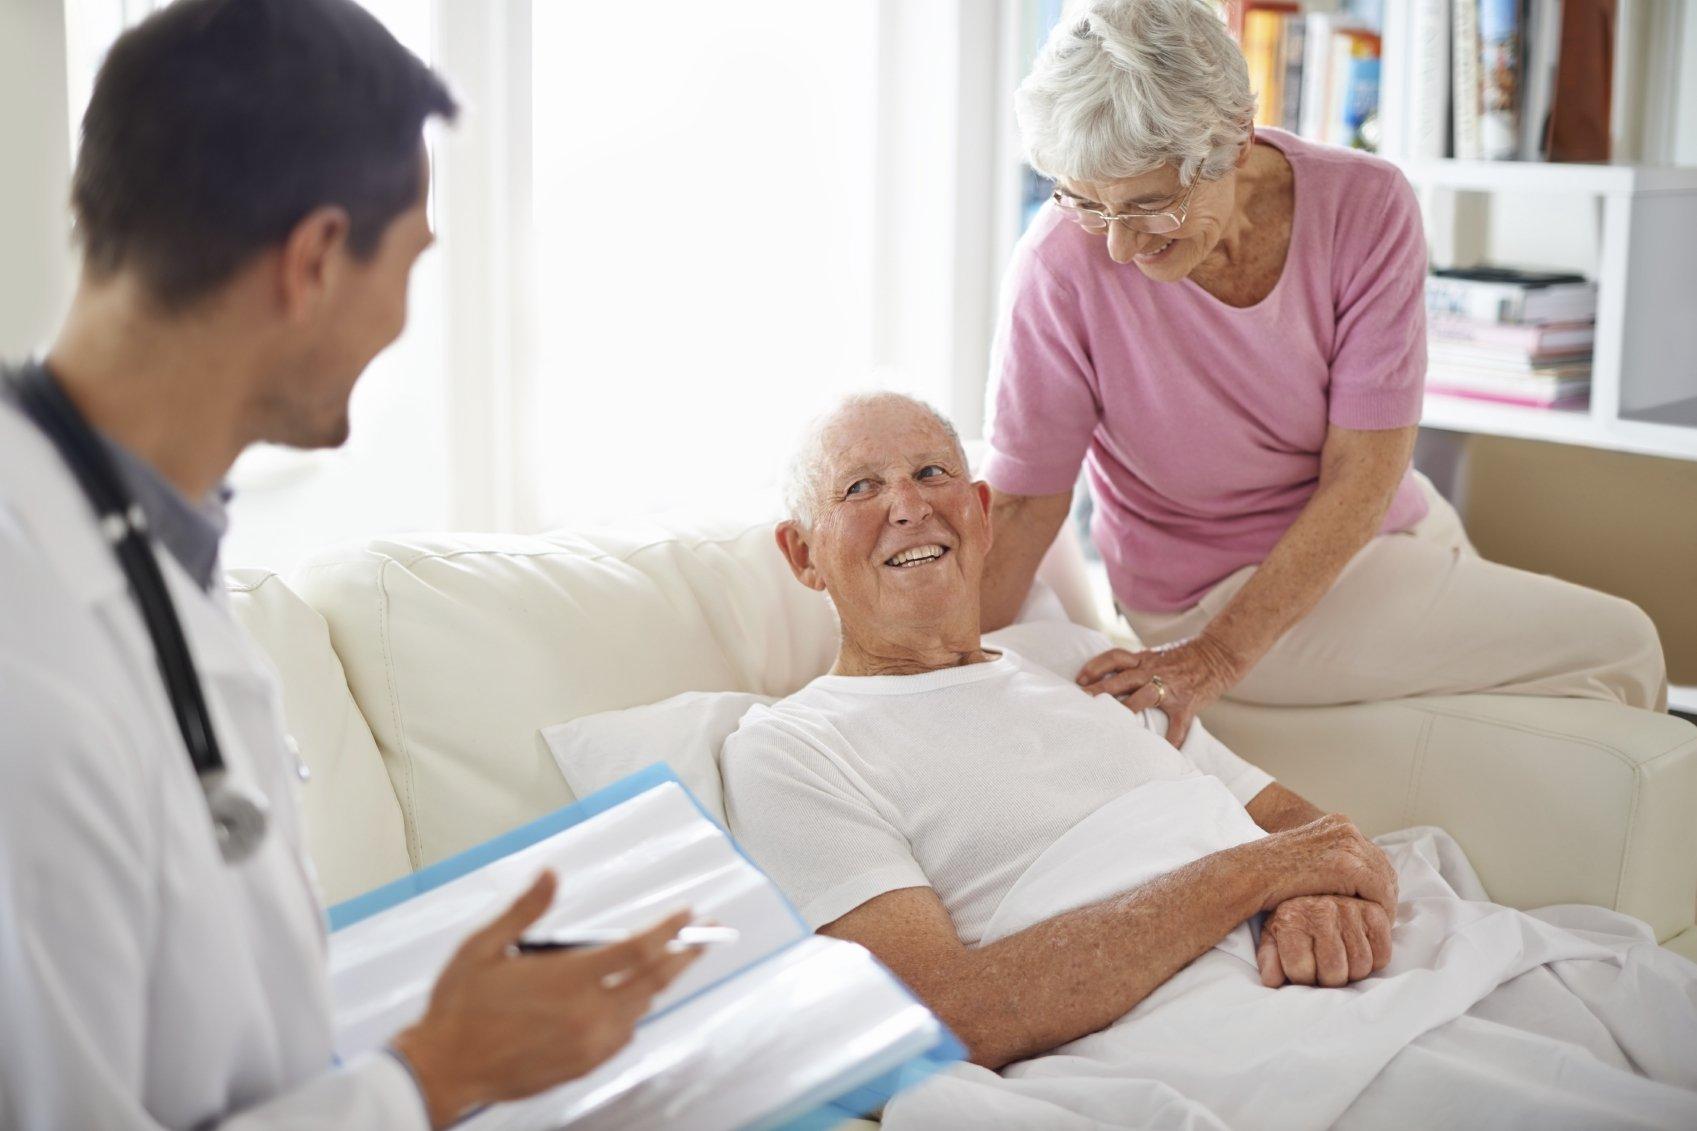 doctor speaking with senior man